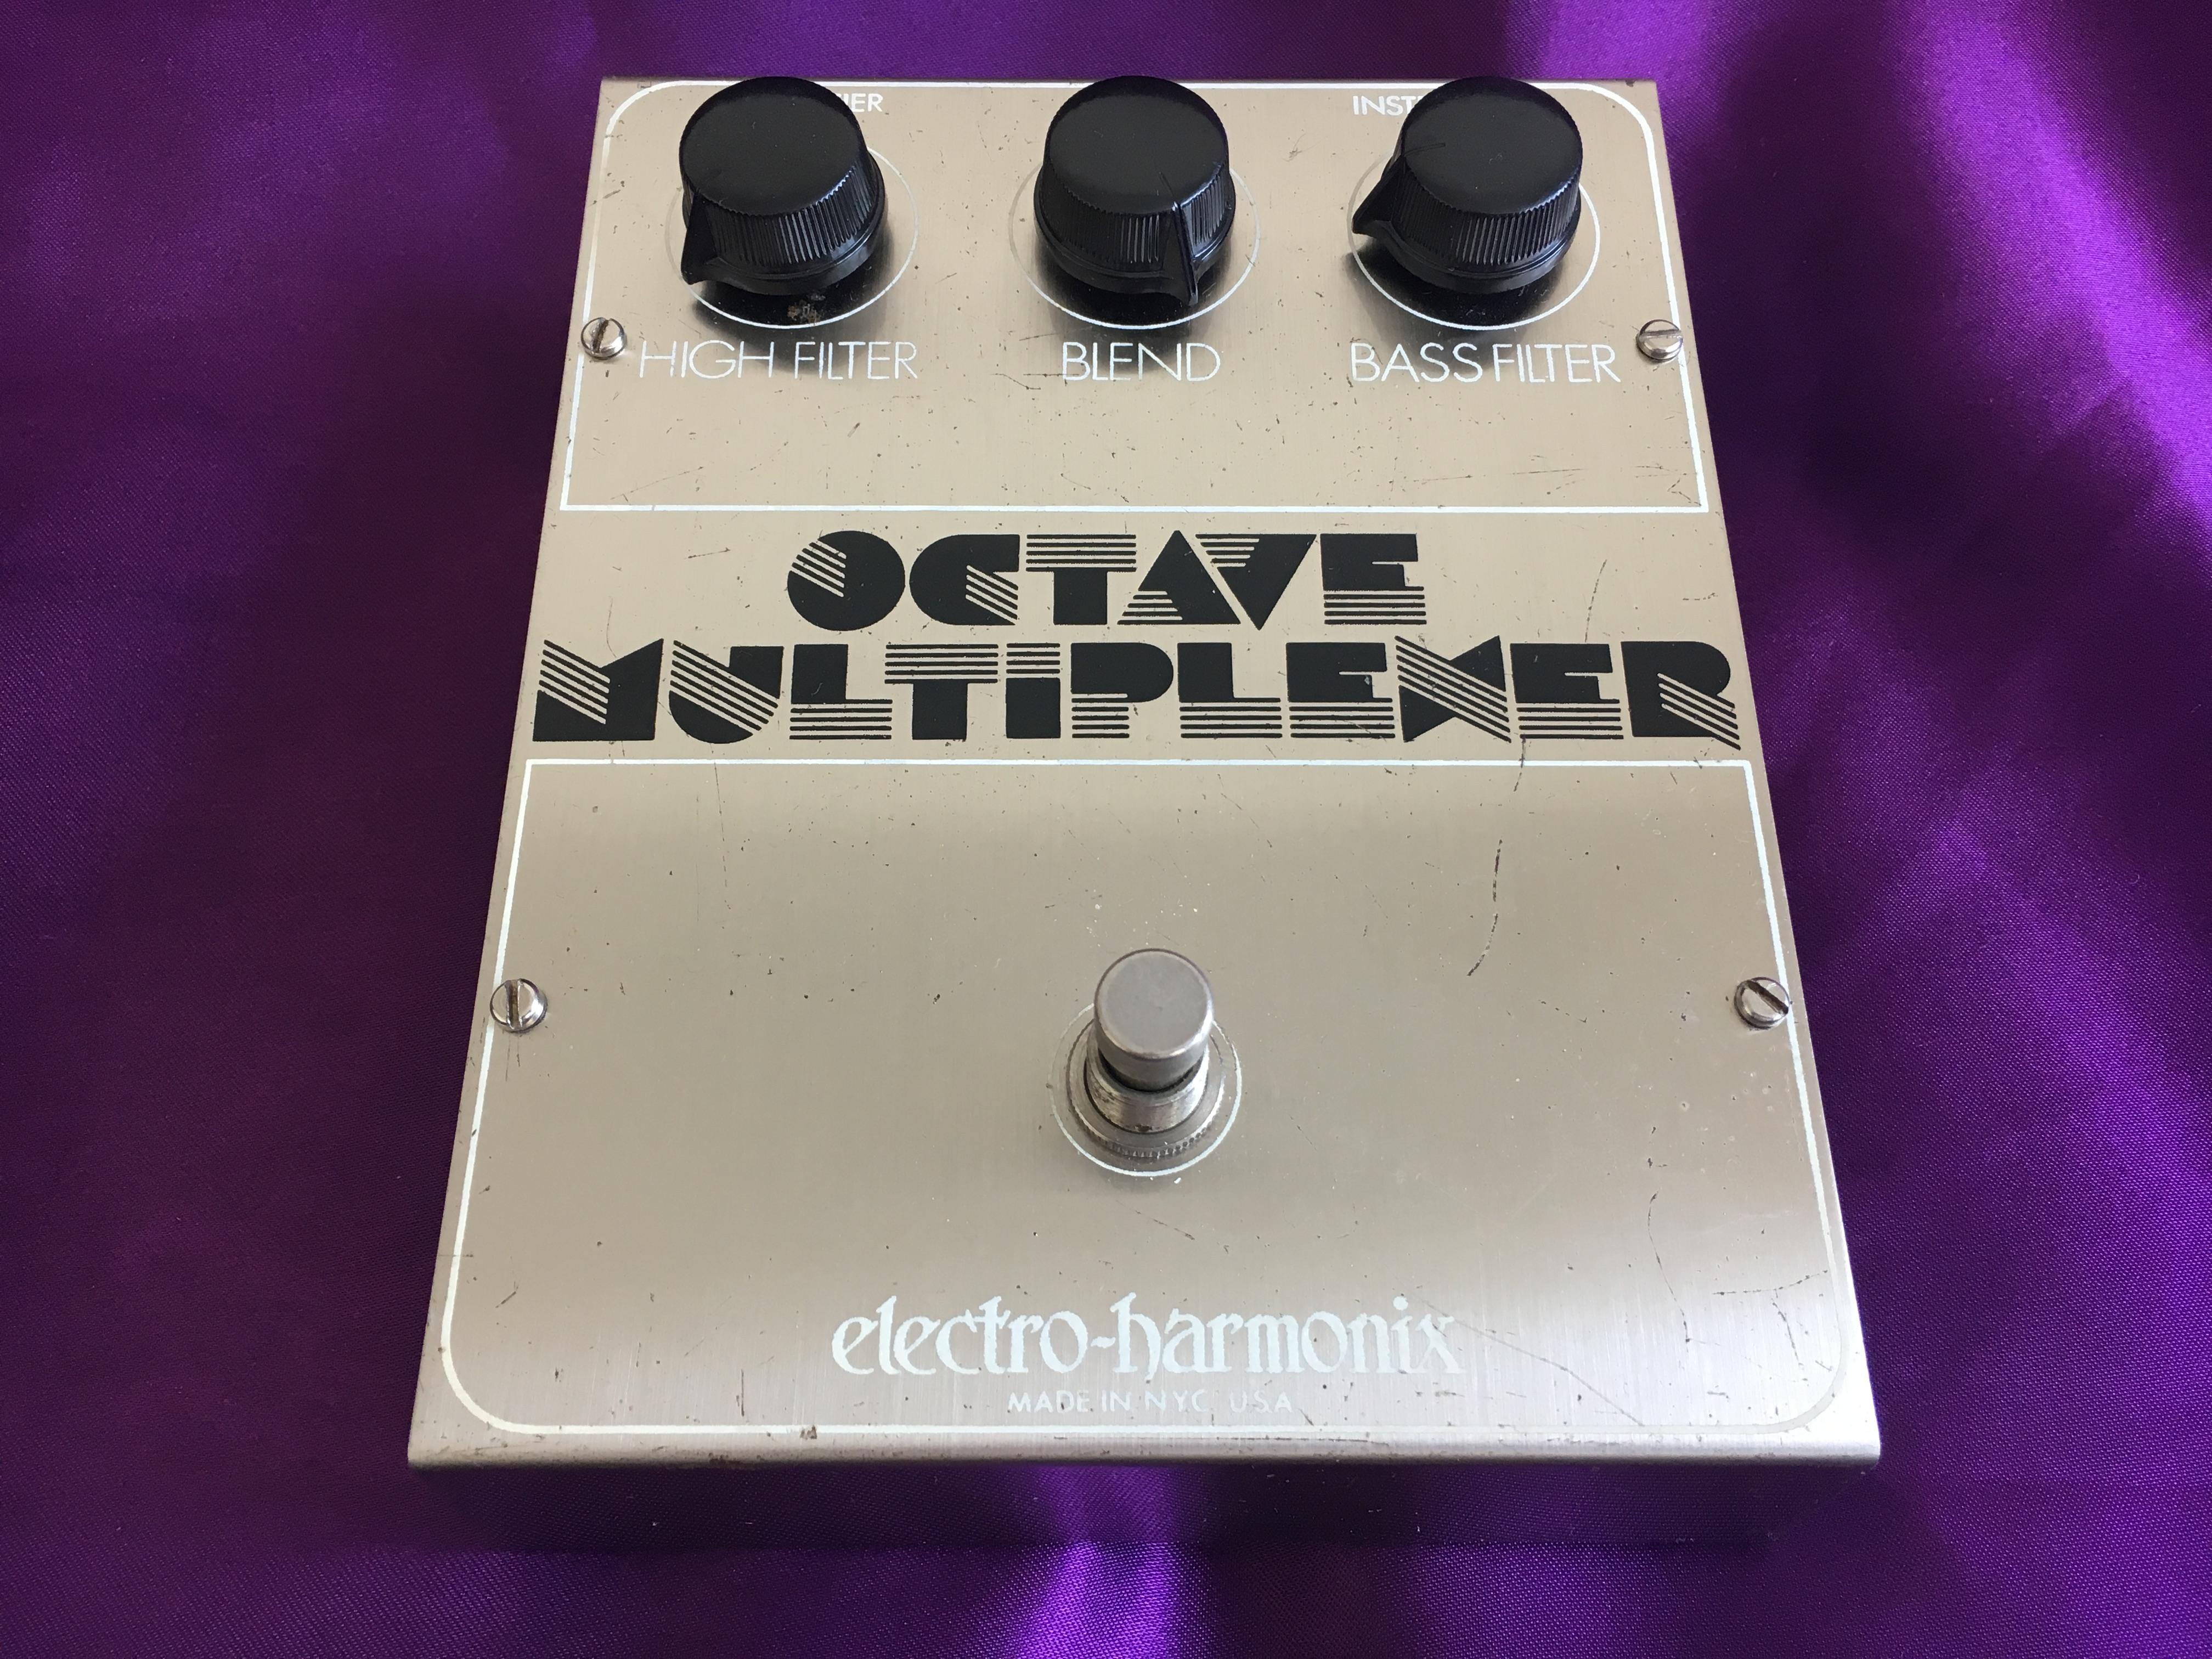 1976 Electro-Harmonix Octave Multiplexer